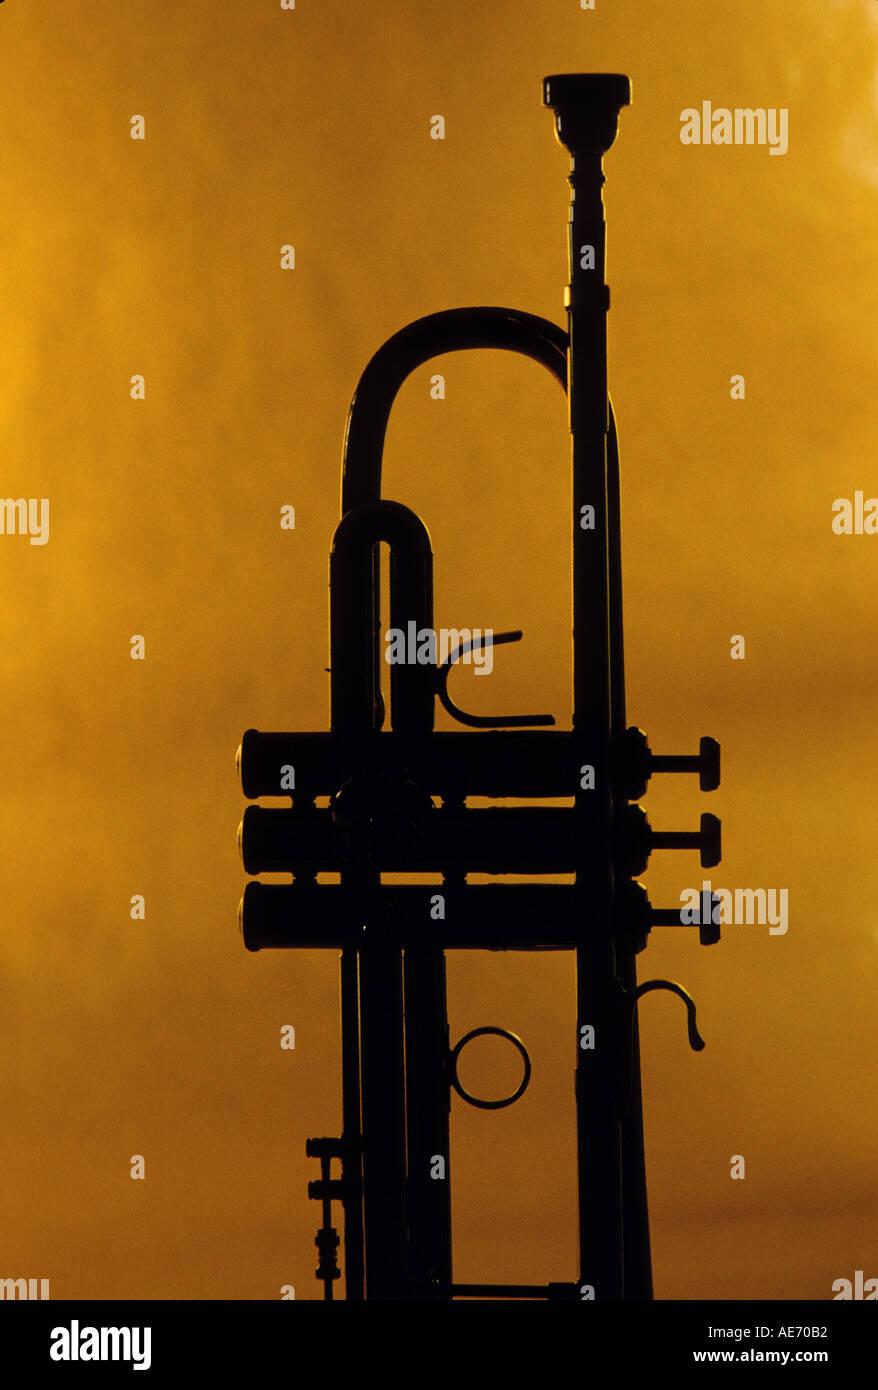 Trumpet silhouette - Stock Image